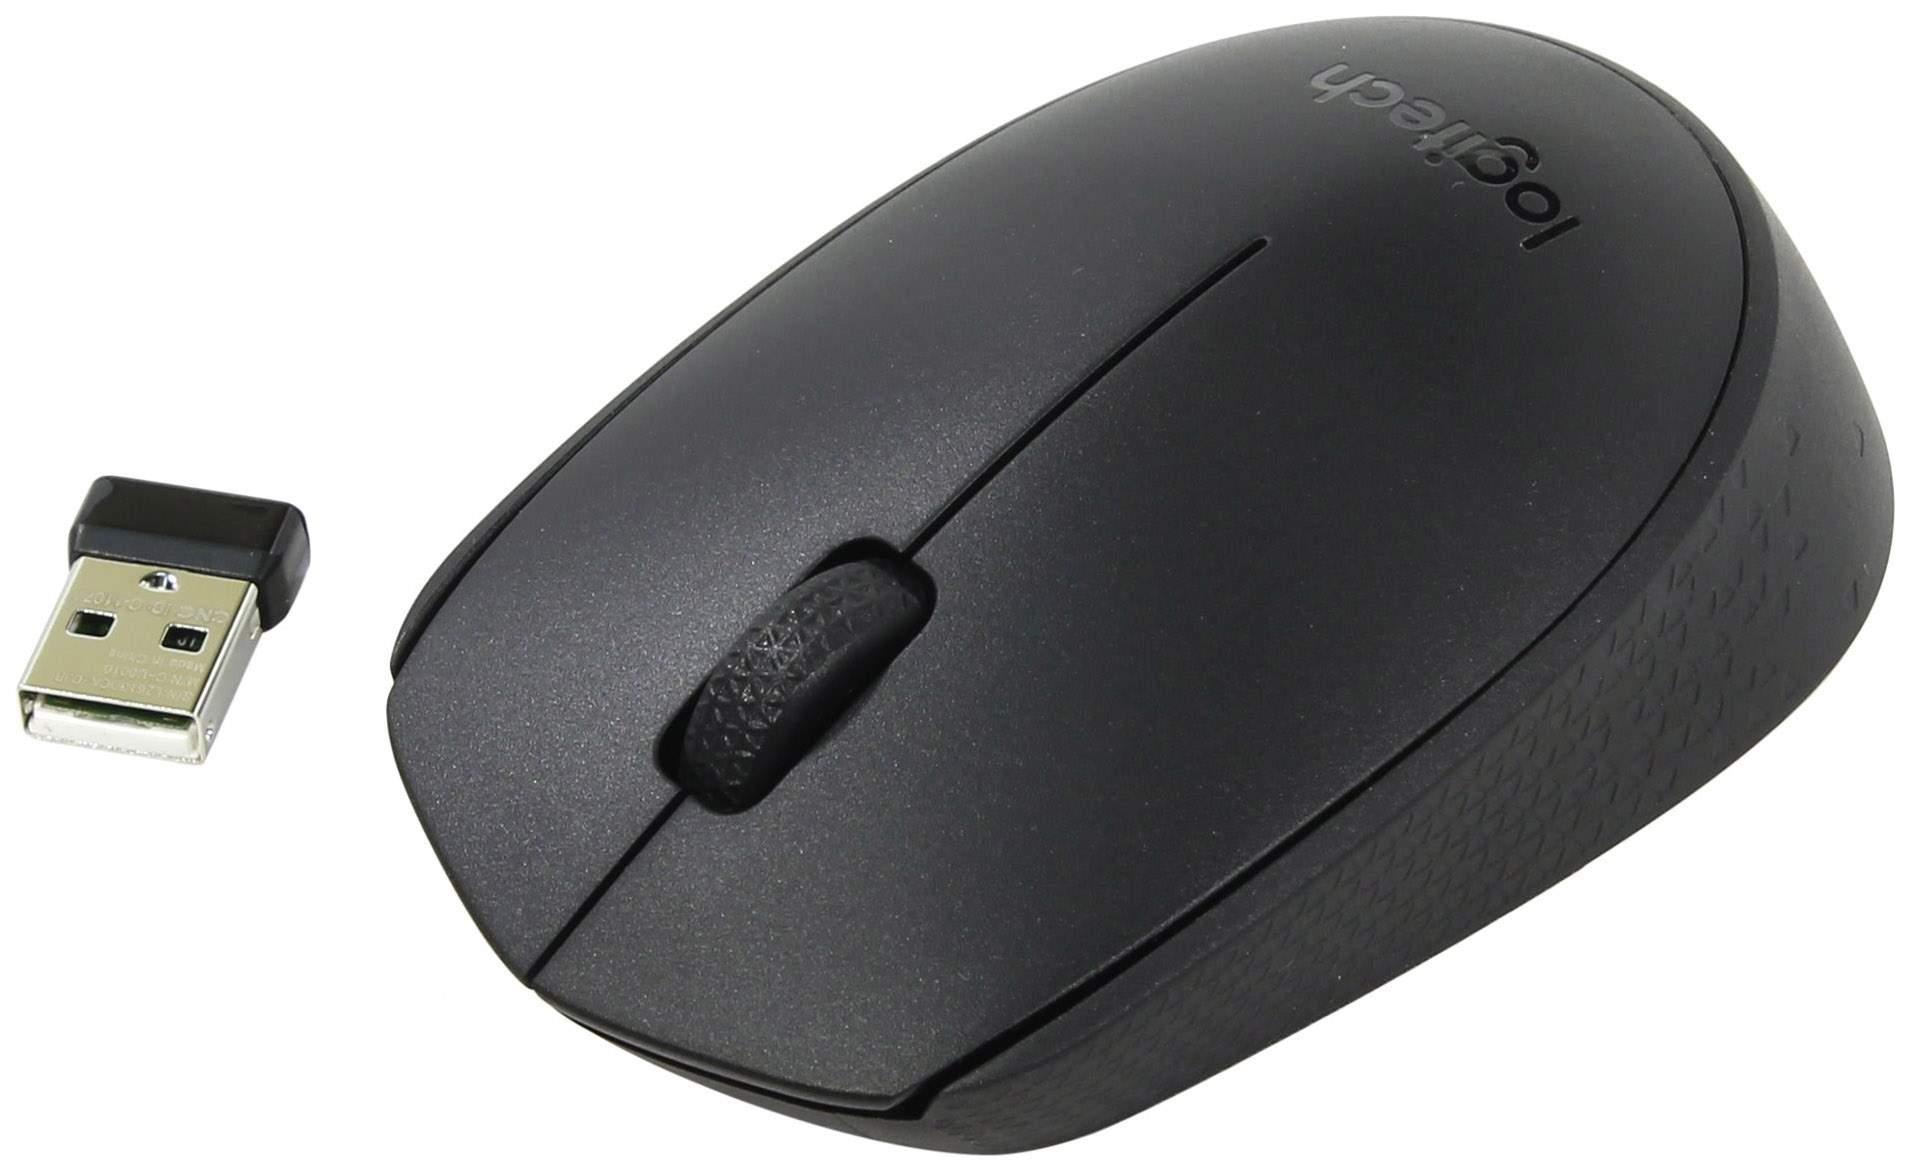 Беспроводная мышка Logitech B170 Black (910-004798)